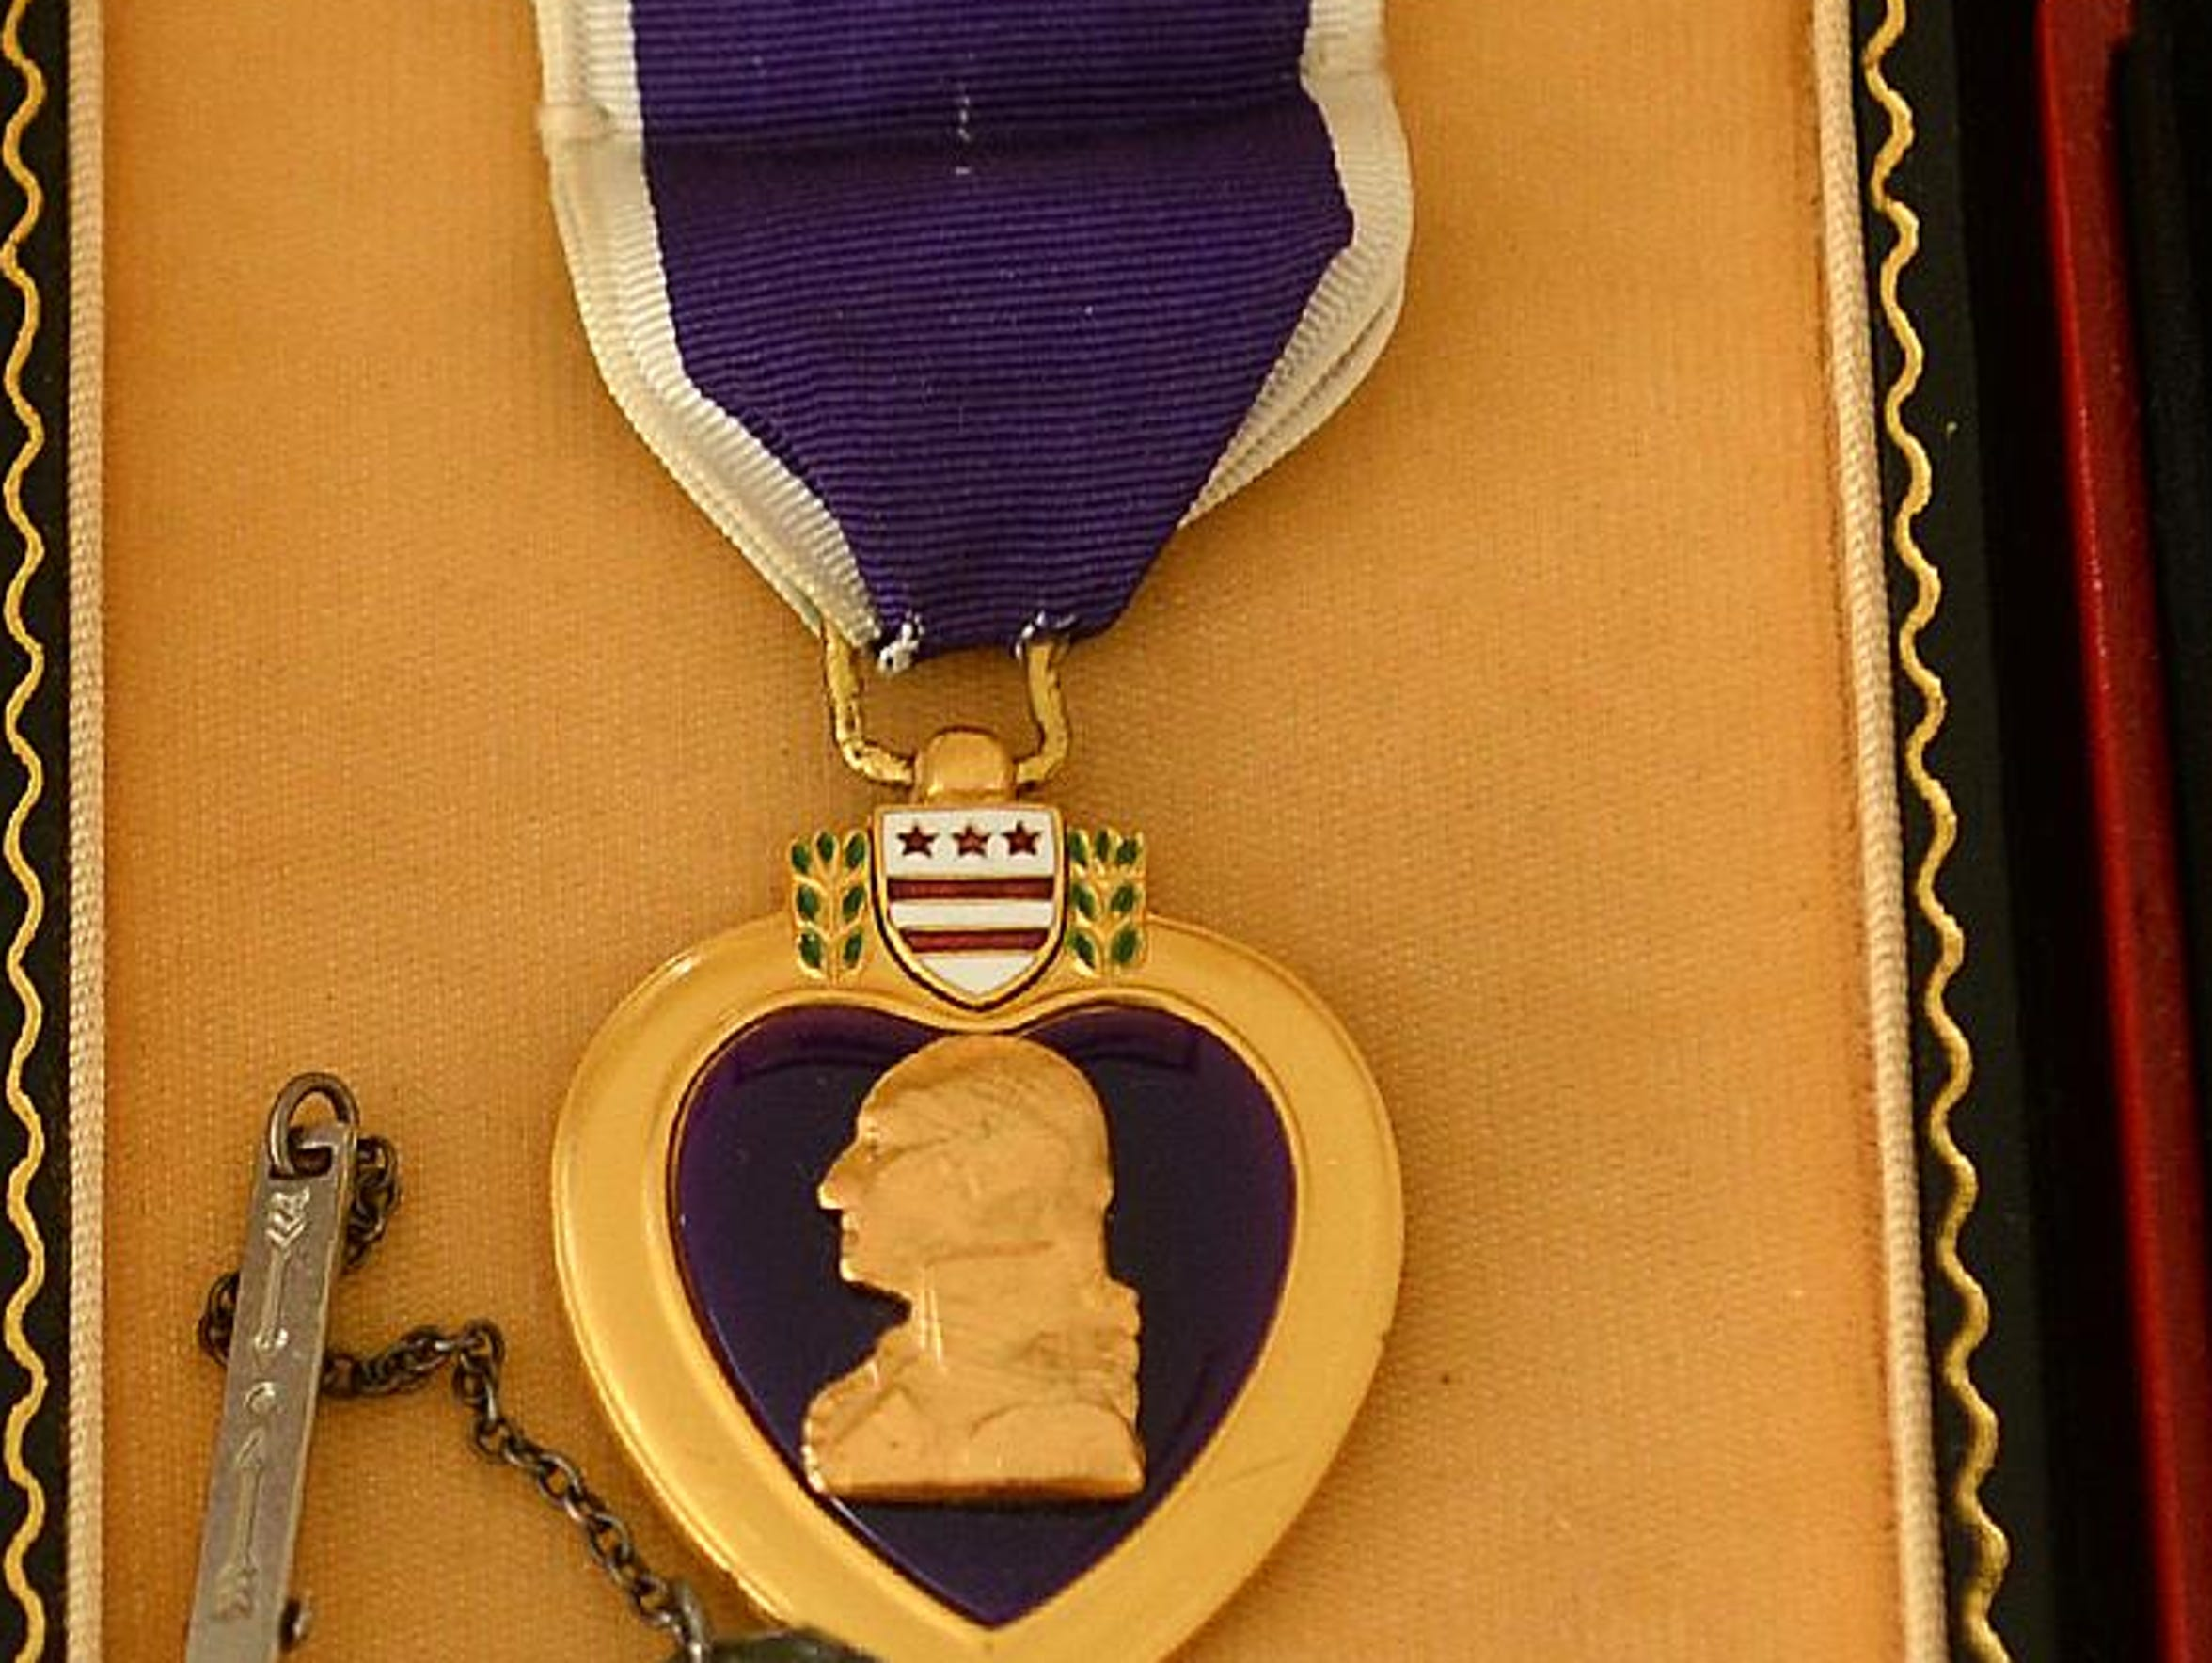 Medals earned by World War II veteran Bud Olson of